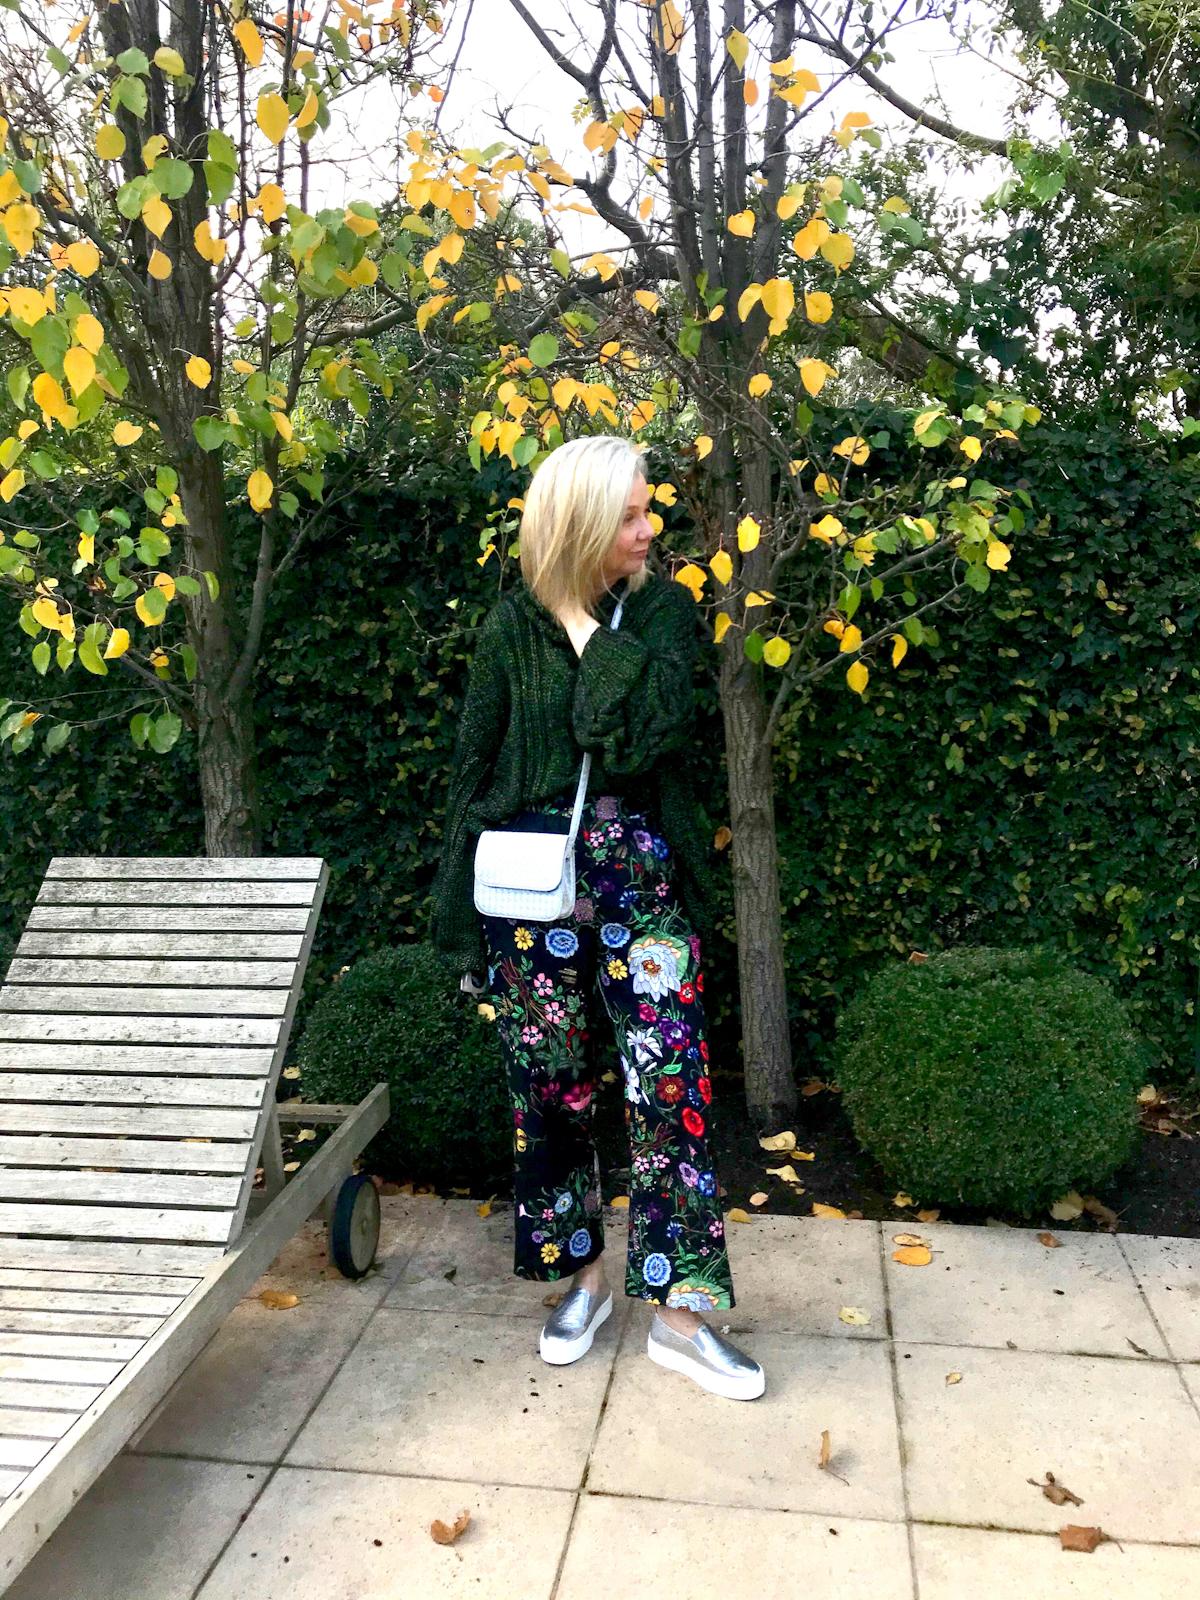 sarah london in metallic wedges and long skirt